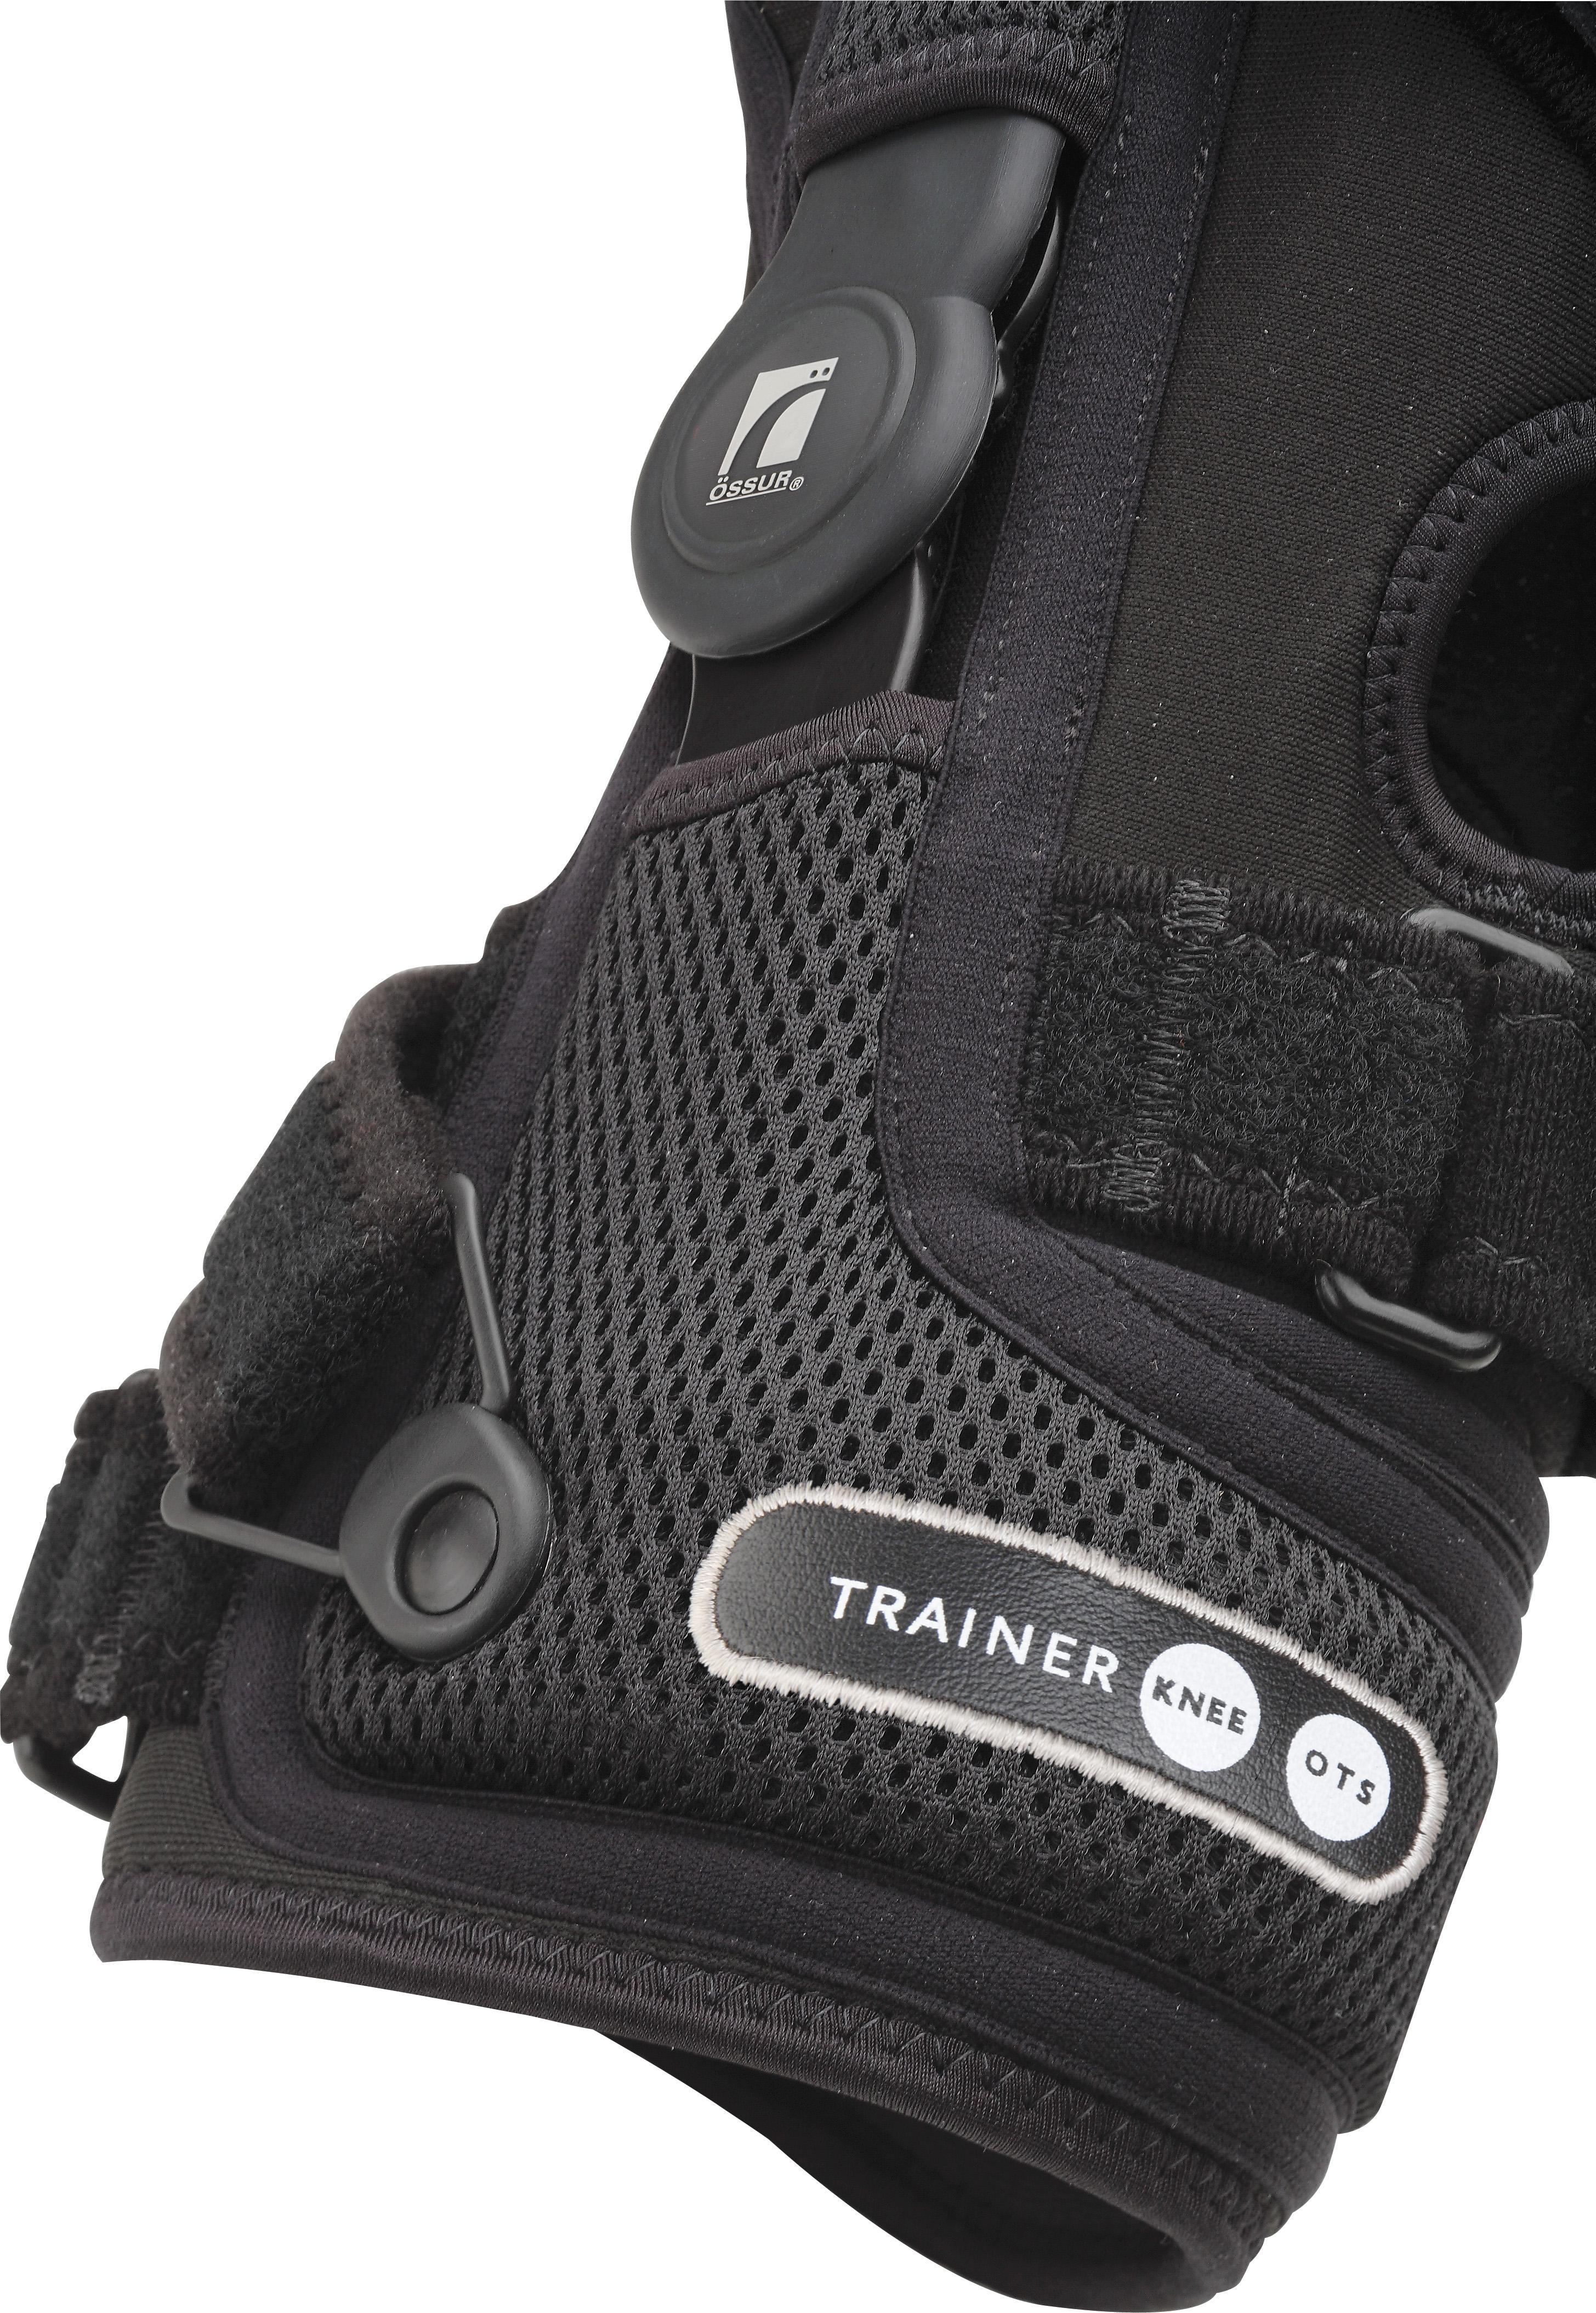 trainer-left-xsmallall-b-237600001-ossur-os378064-6.jpg